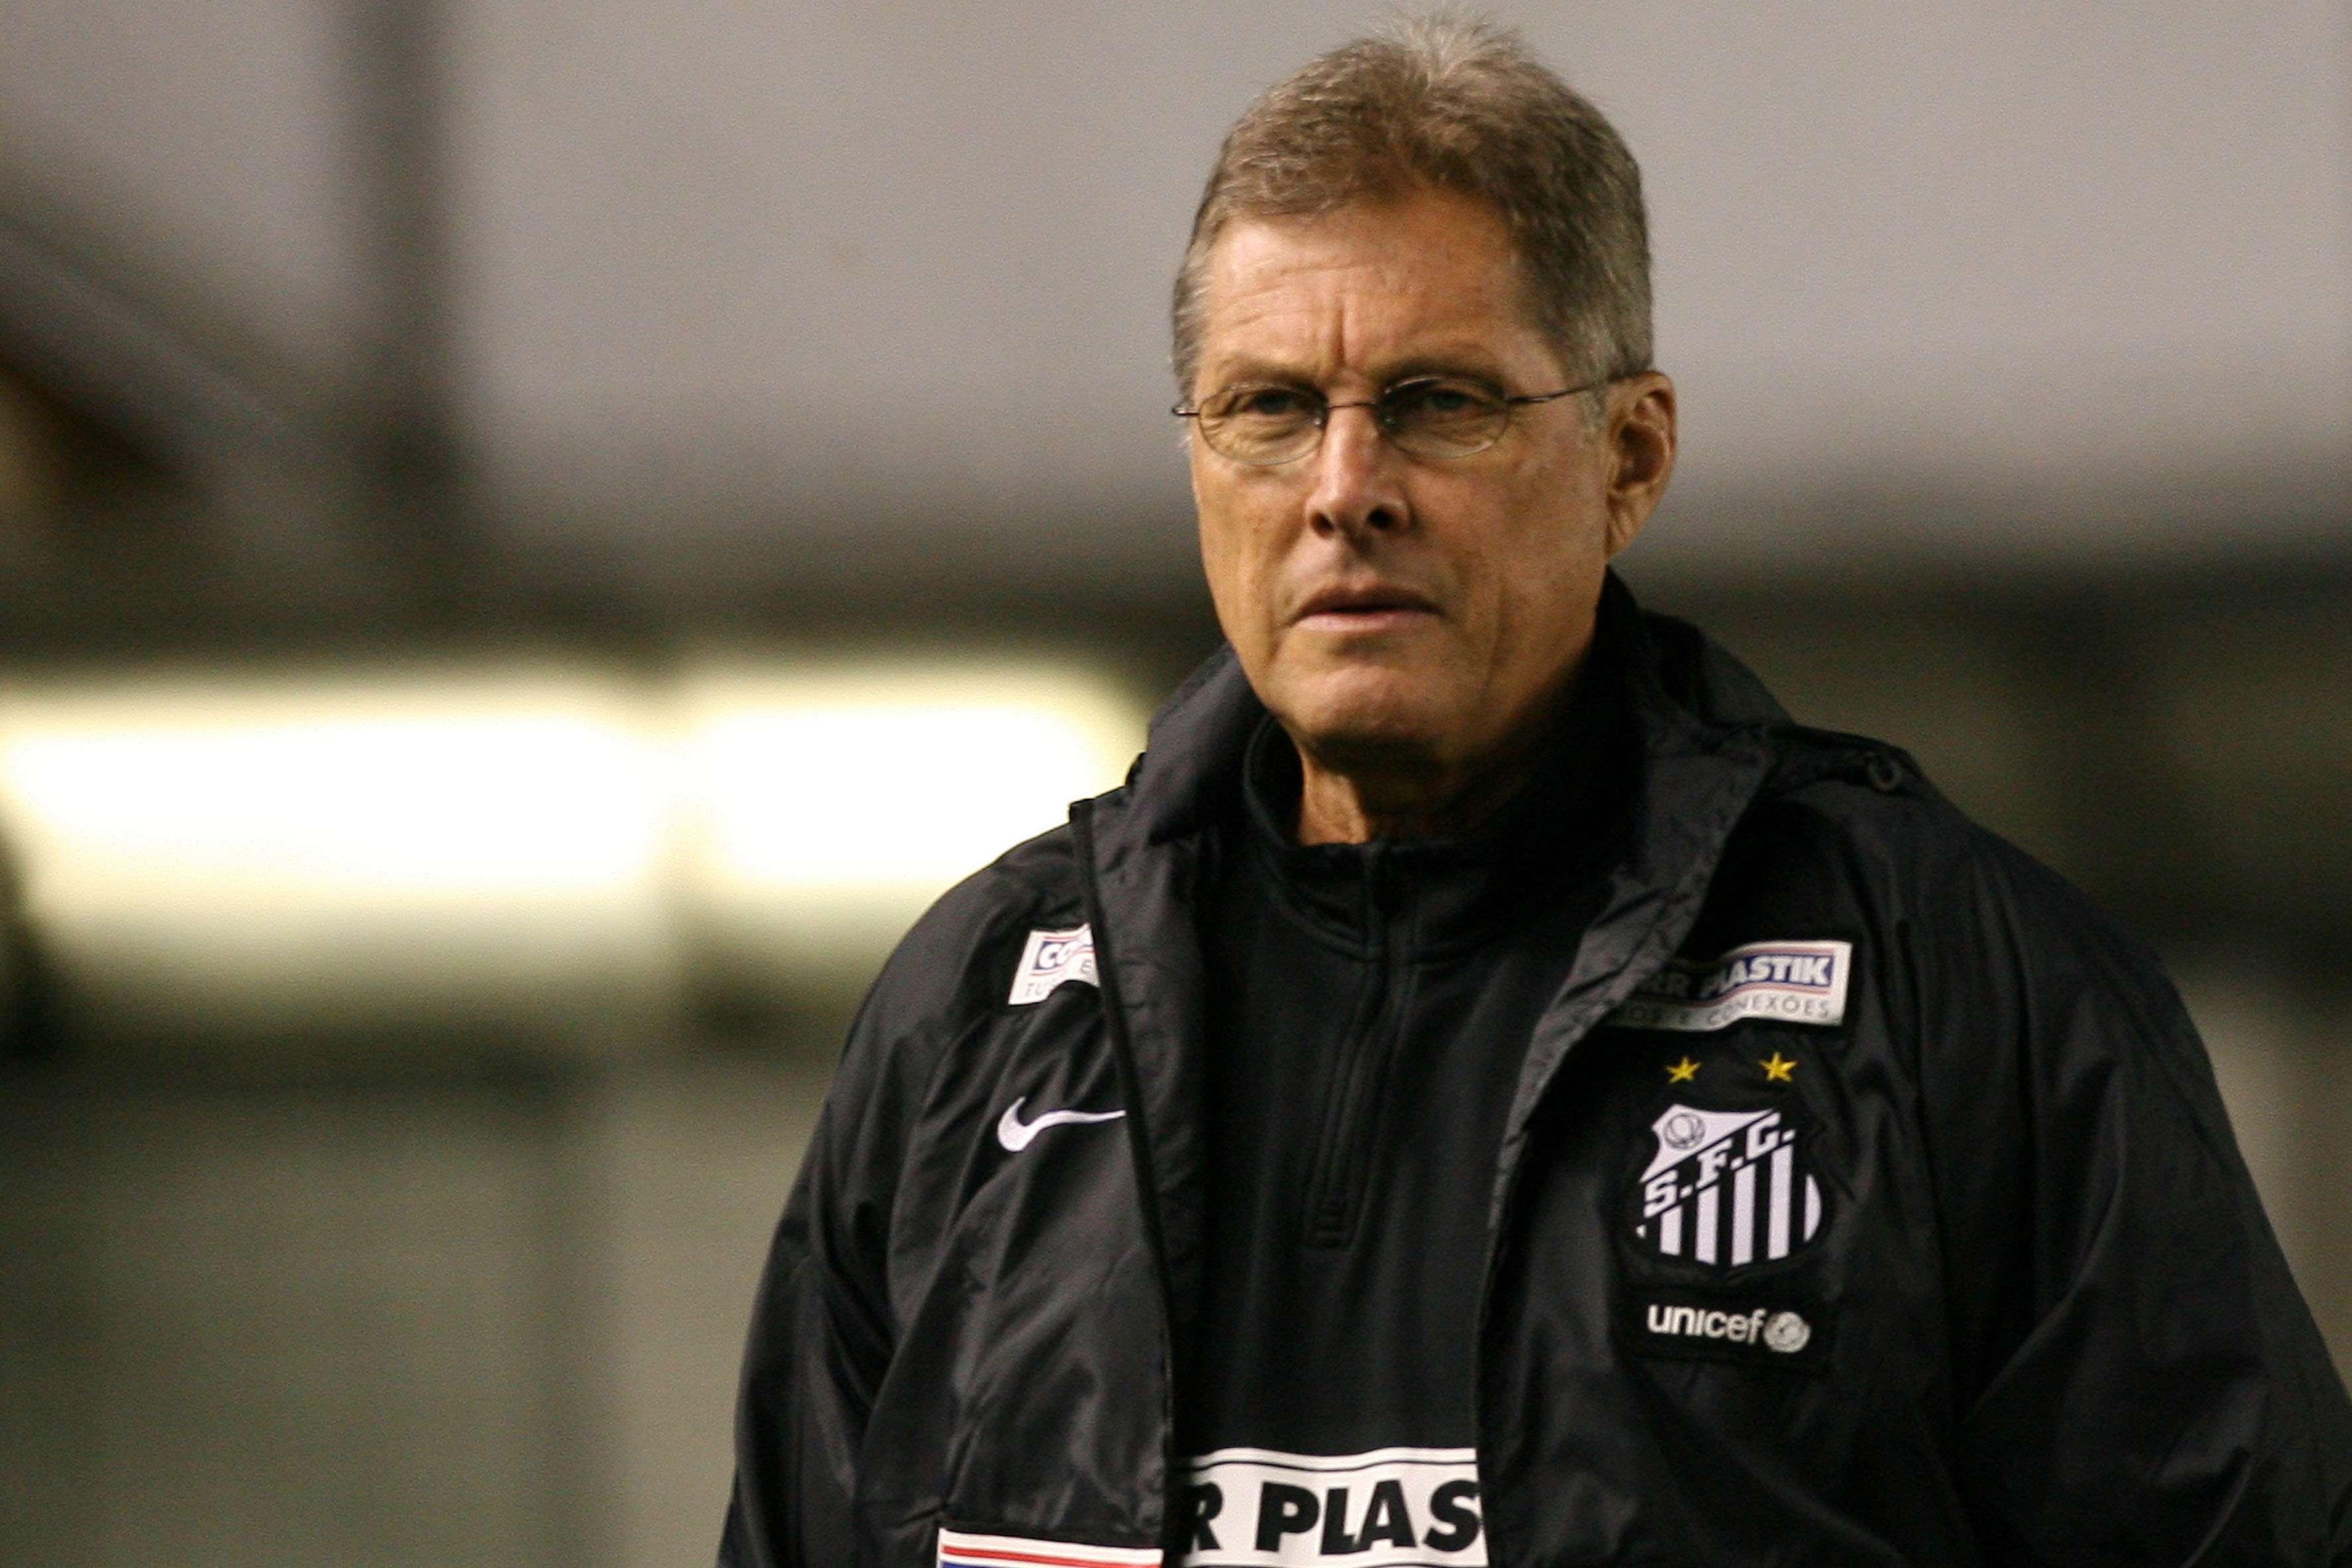 Guilherme Dionizio